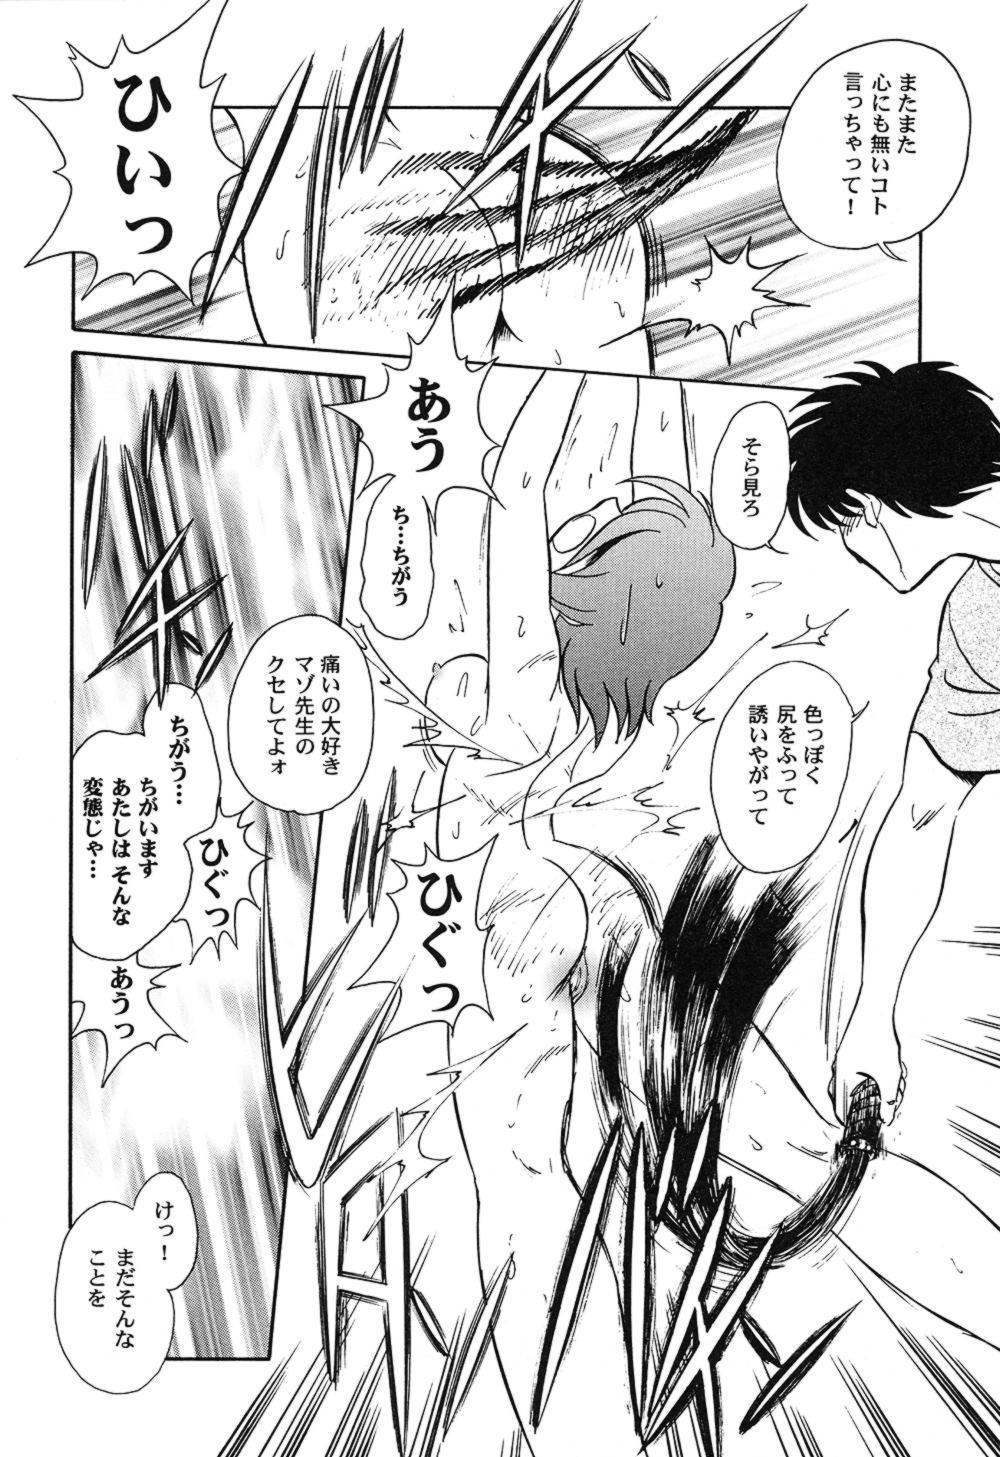 Hageshii Kagai Jugyou 64